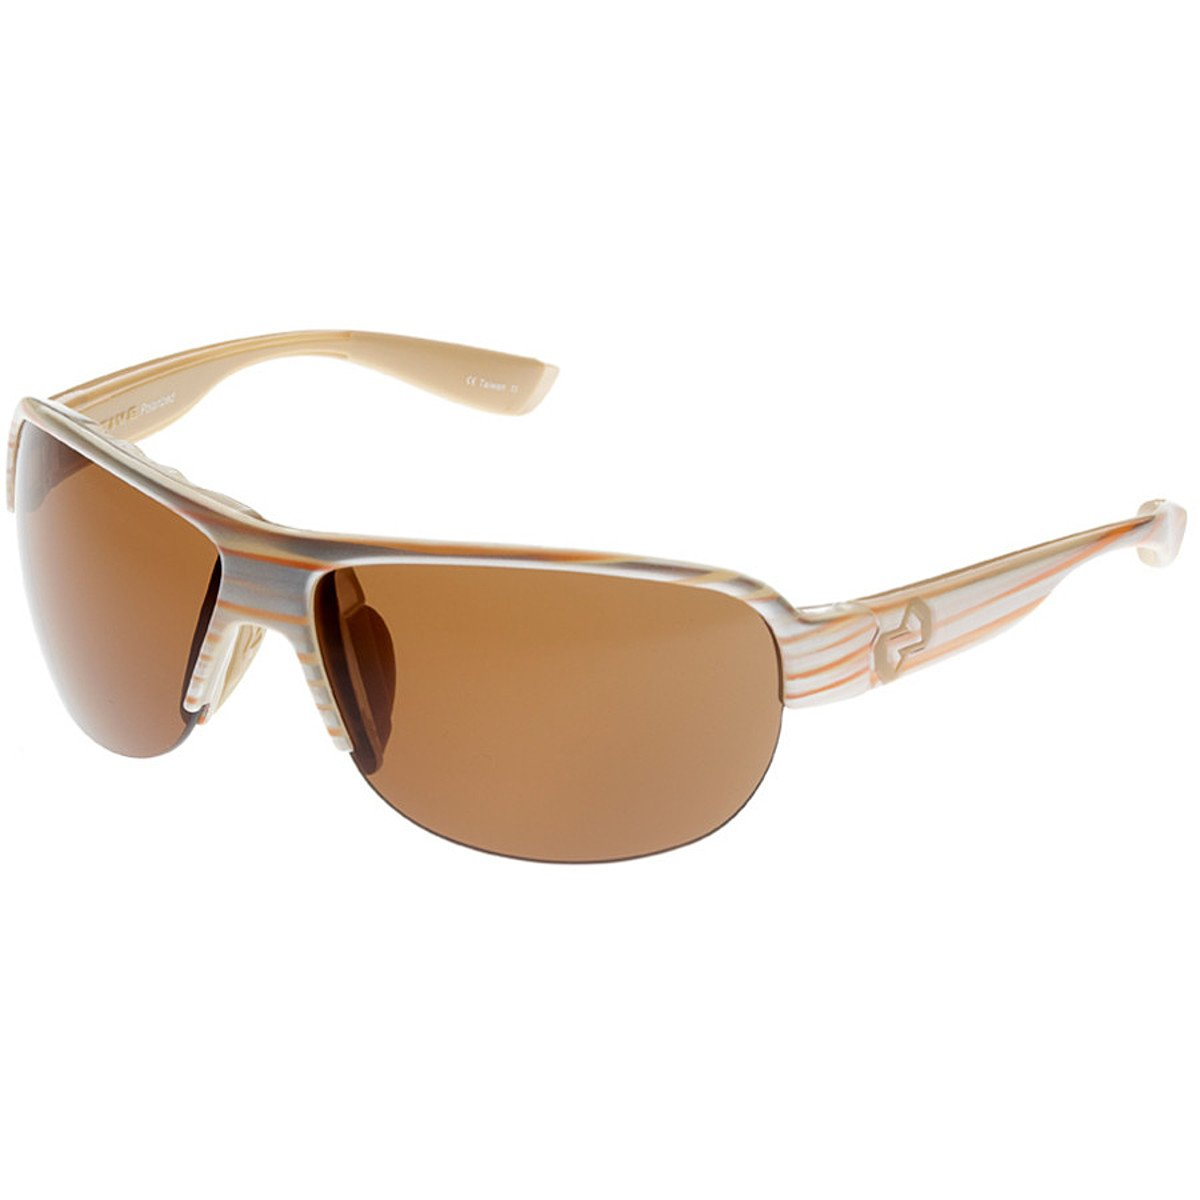 Native Zodiac Interchangeable Polarized Sunglasses (Brown, Pearl Swirl)